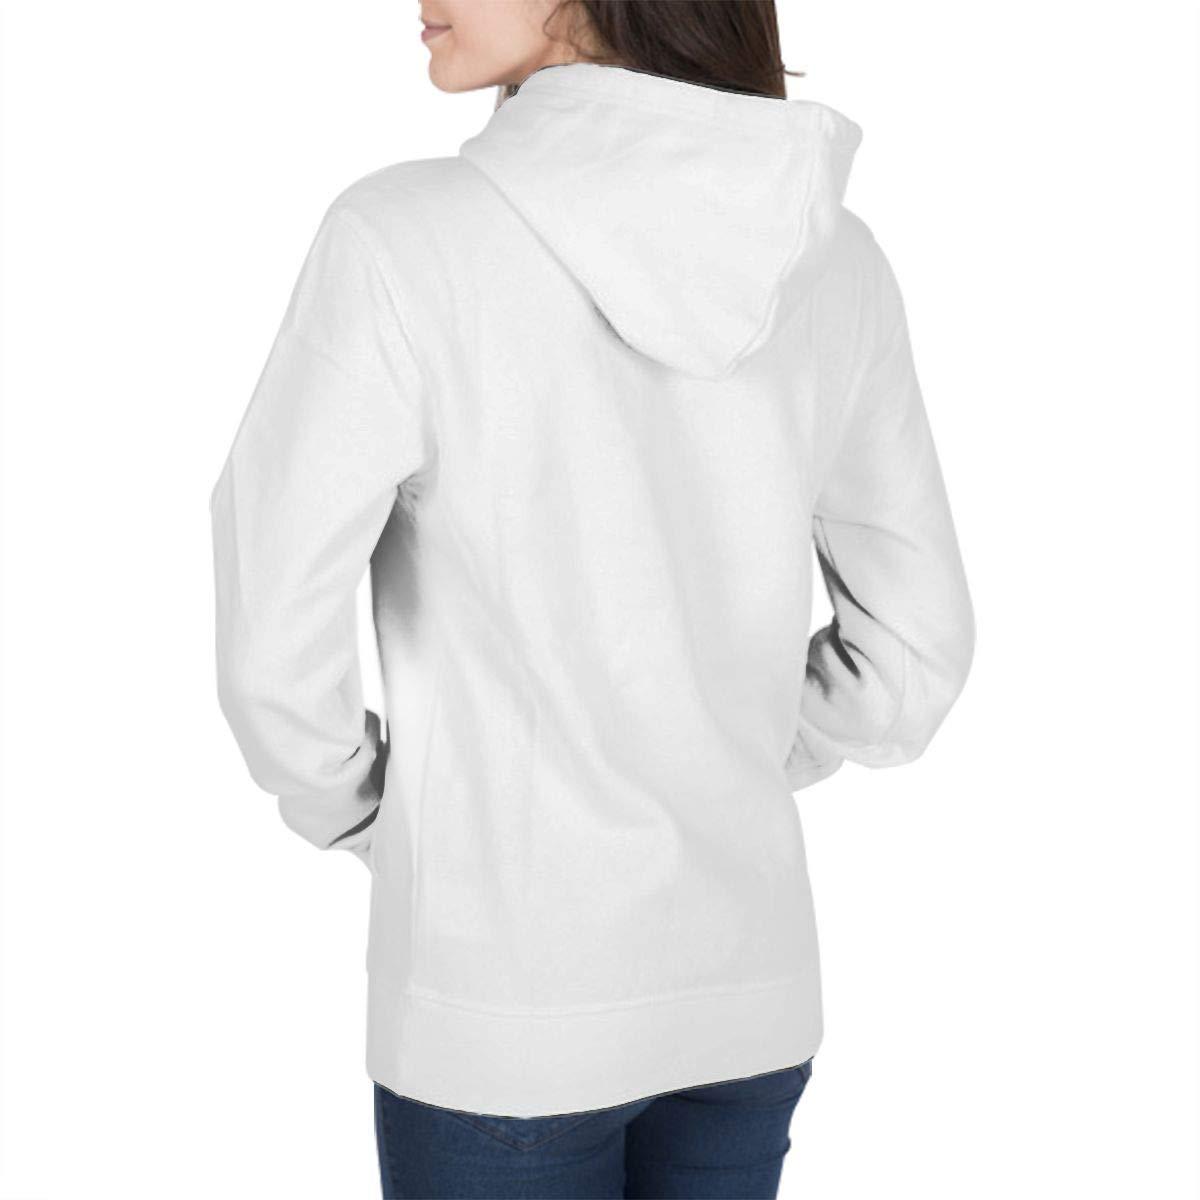 Yksth Hoodie Womens Athletic Queen-Band-Bohemian-Rhapsody White Shirts M